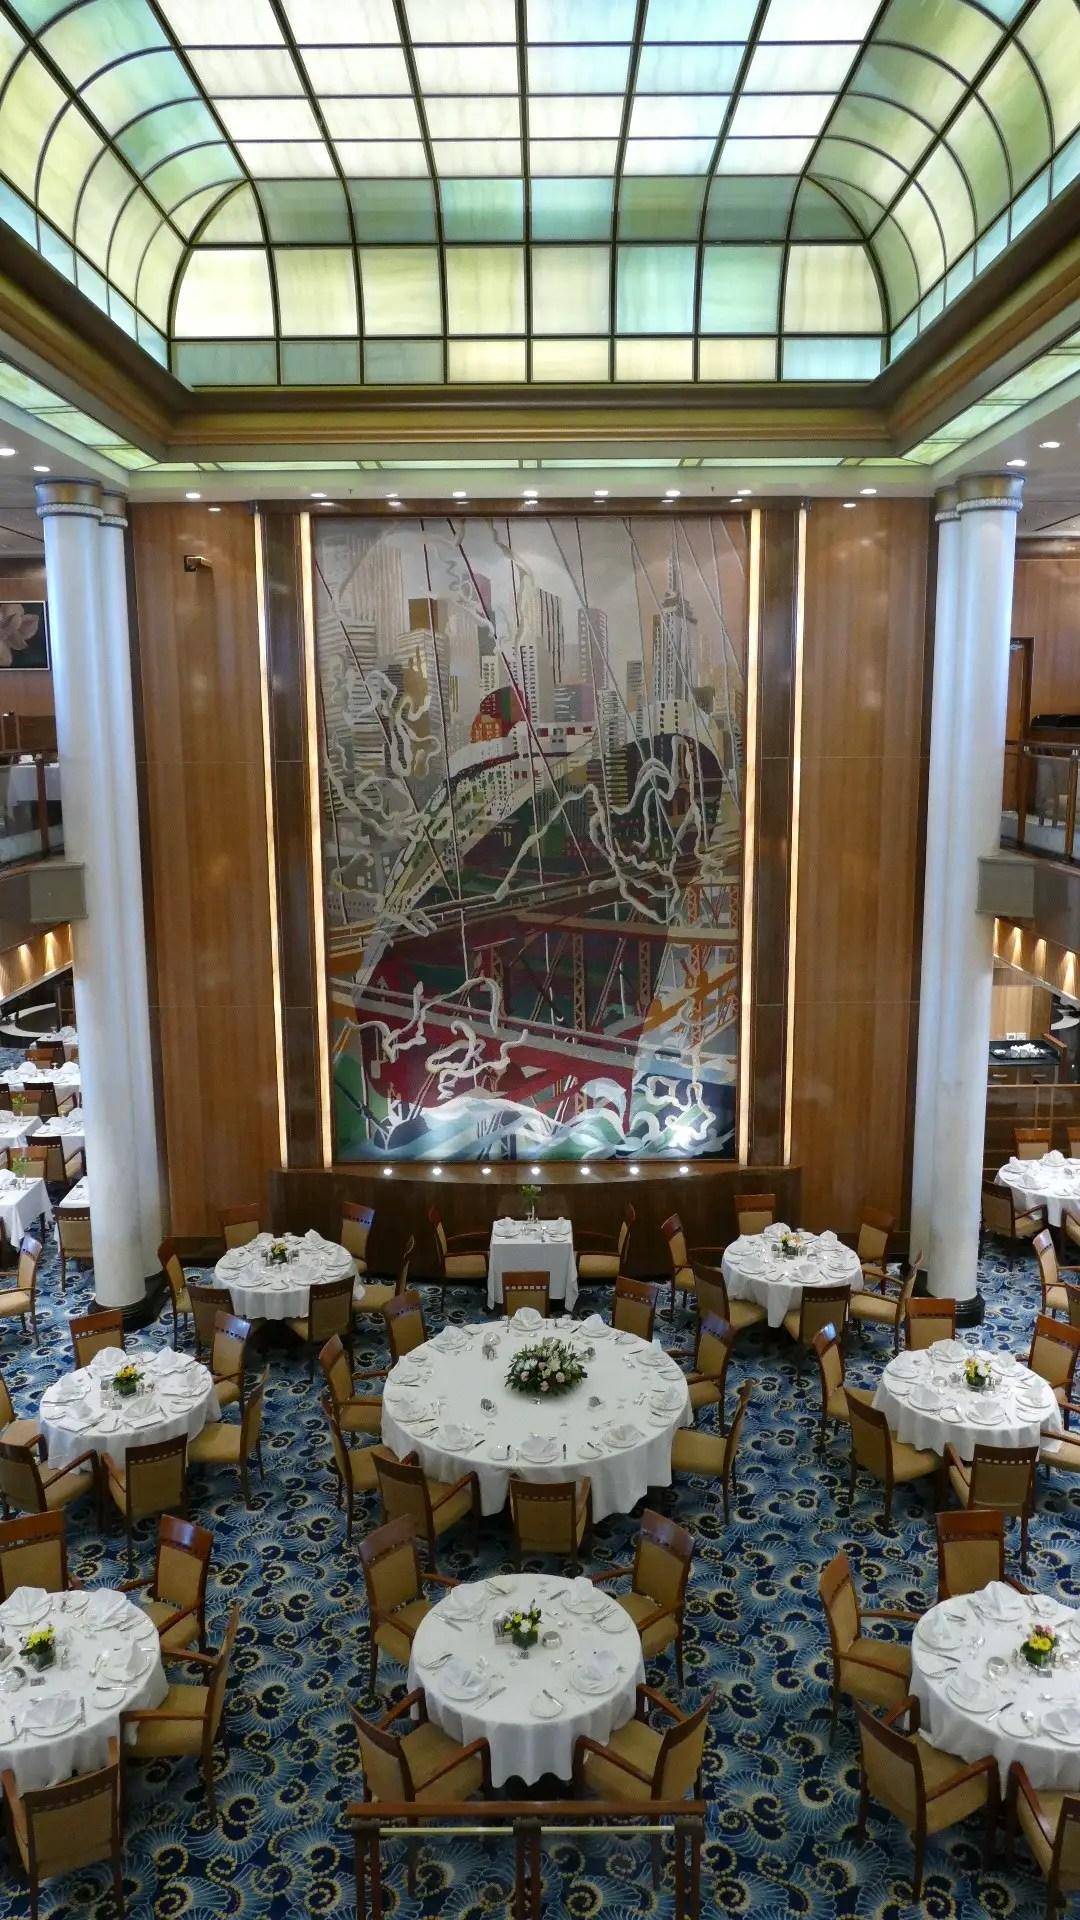 The Britannia Restaurant on Queen Mary 2